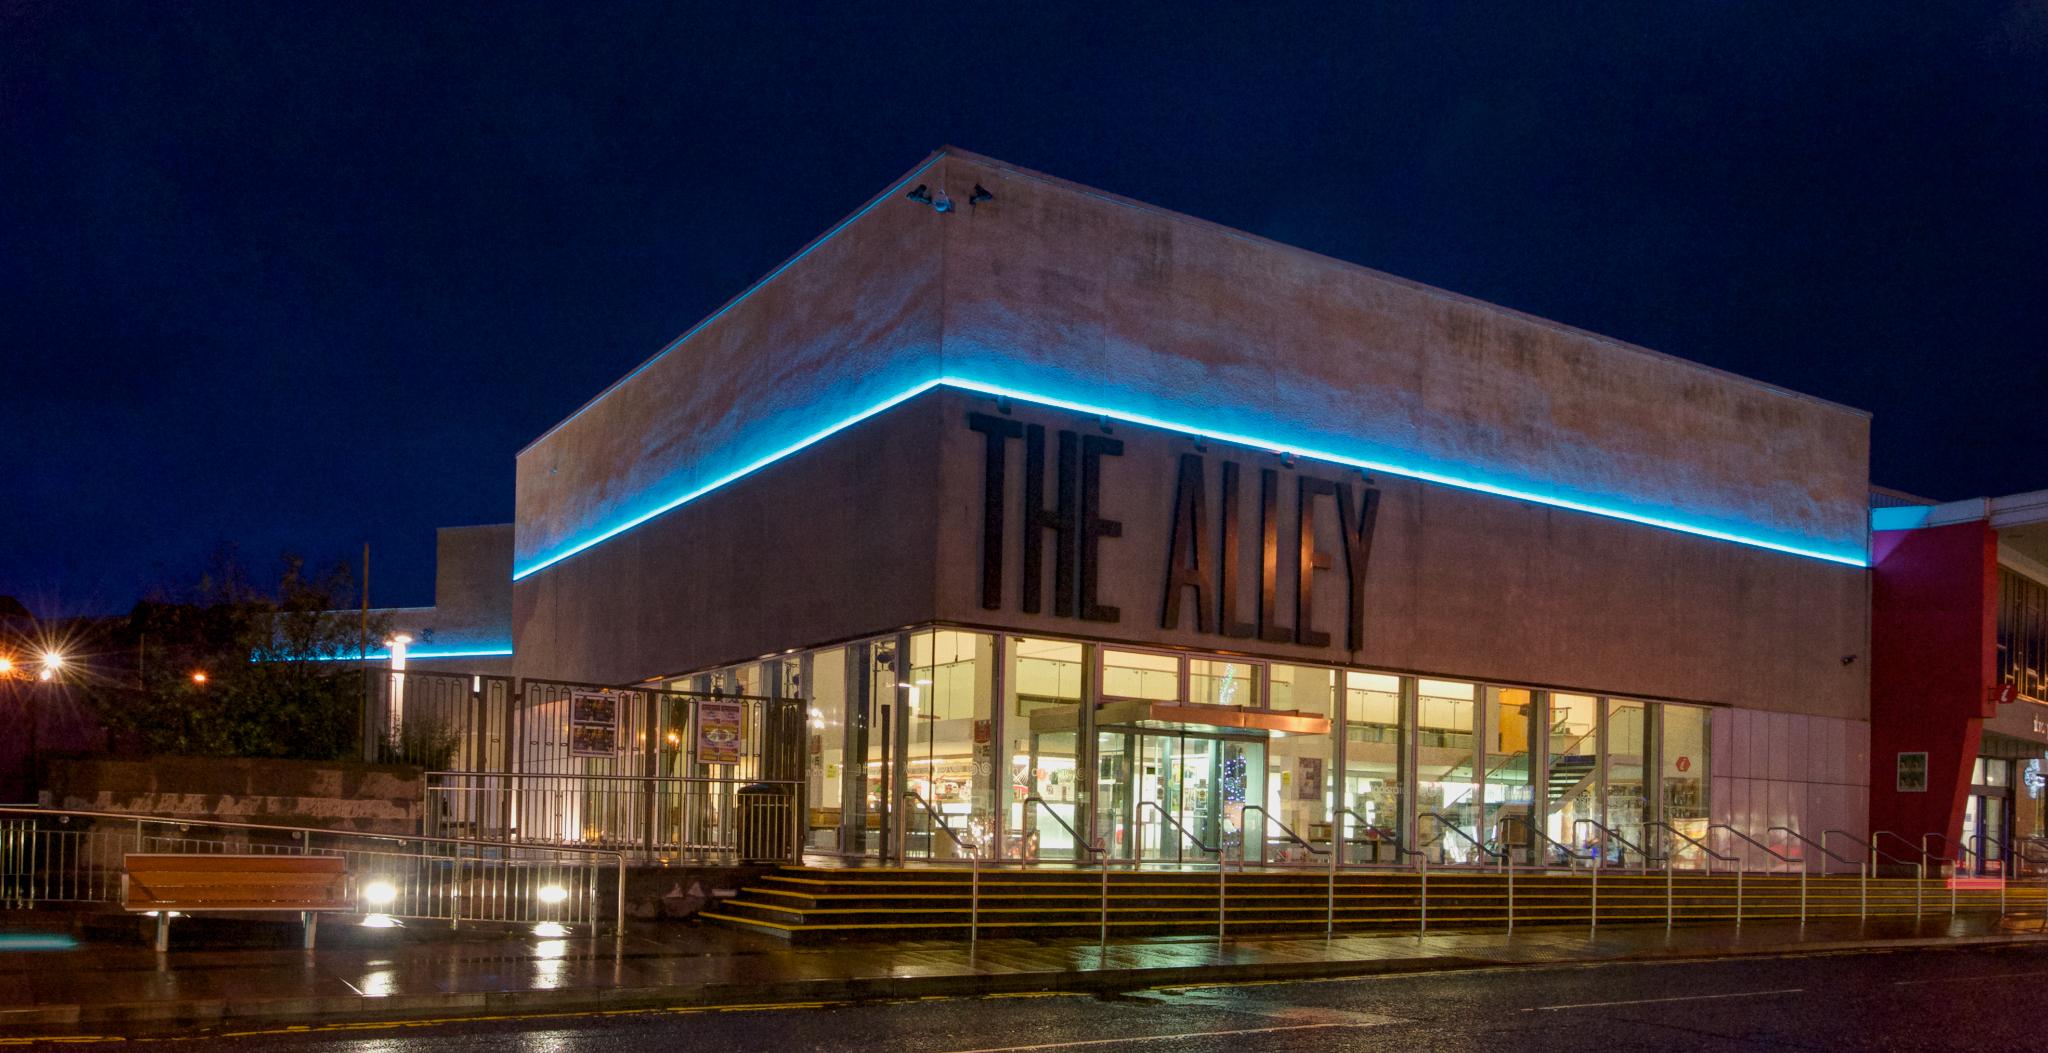 Alley Arts Centre Strabane